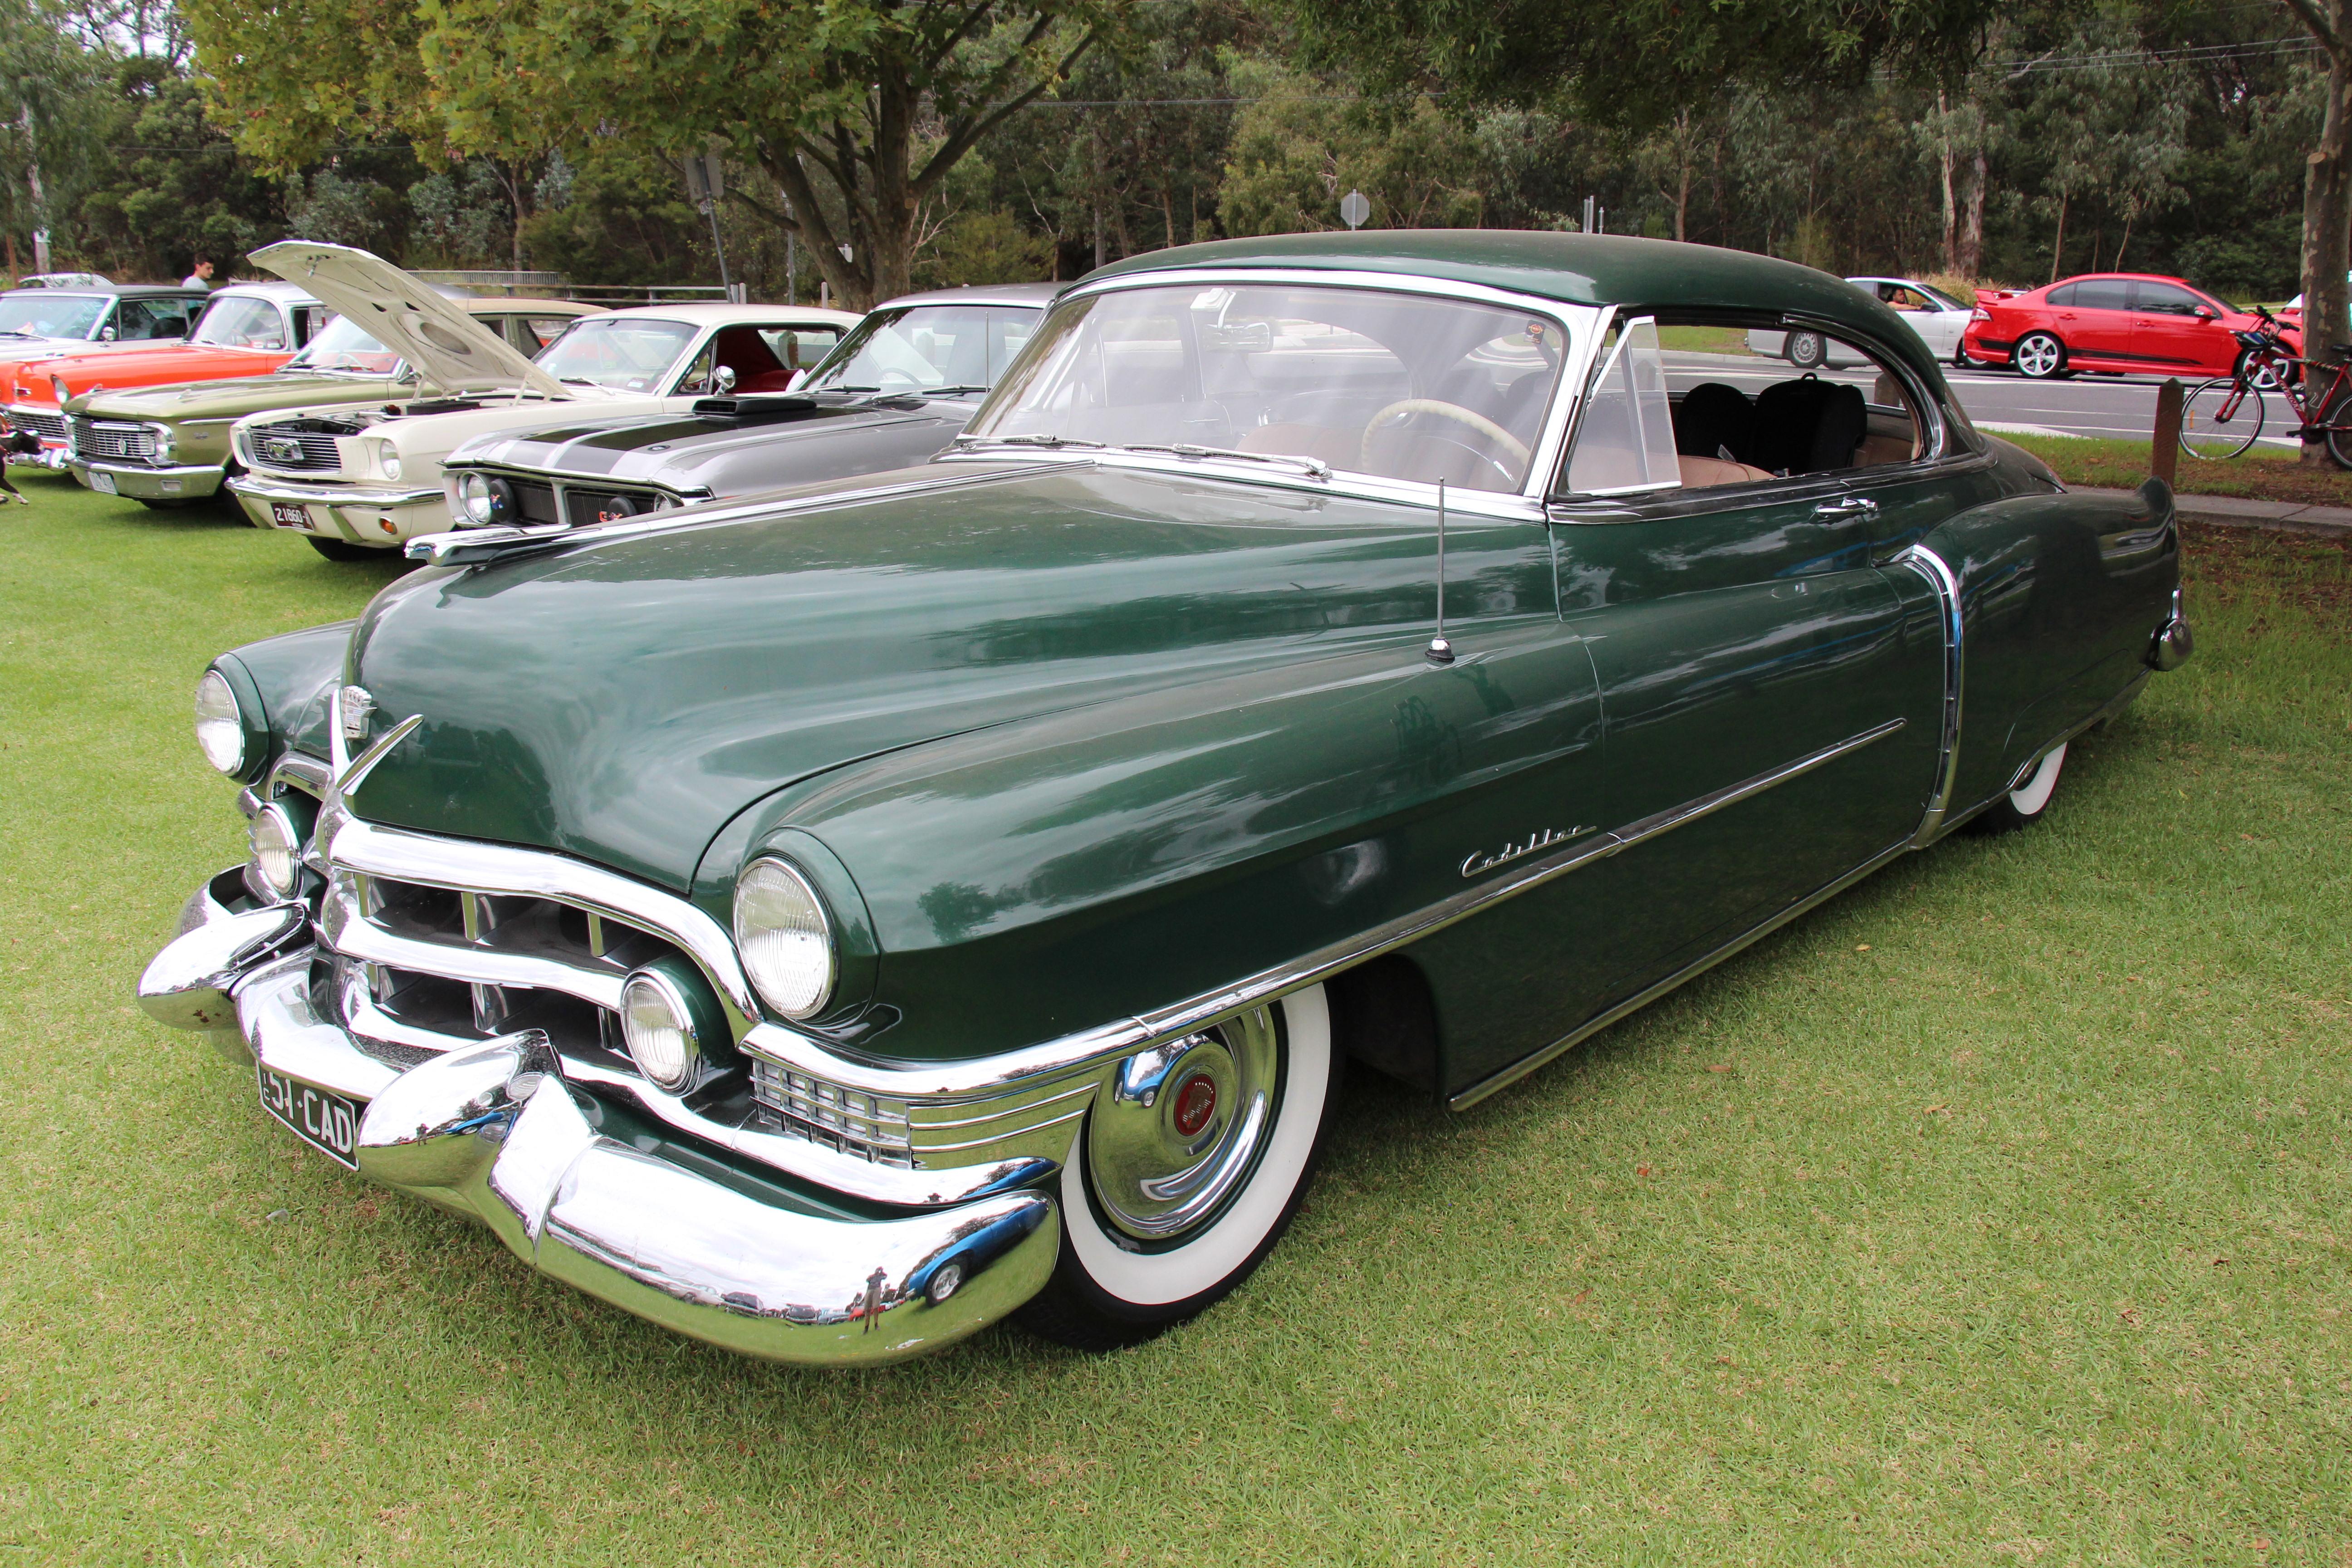 File1951 Cadillac Series 62 Coupe De Ville 25233599743 1951 Sedan Deville